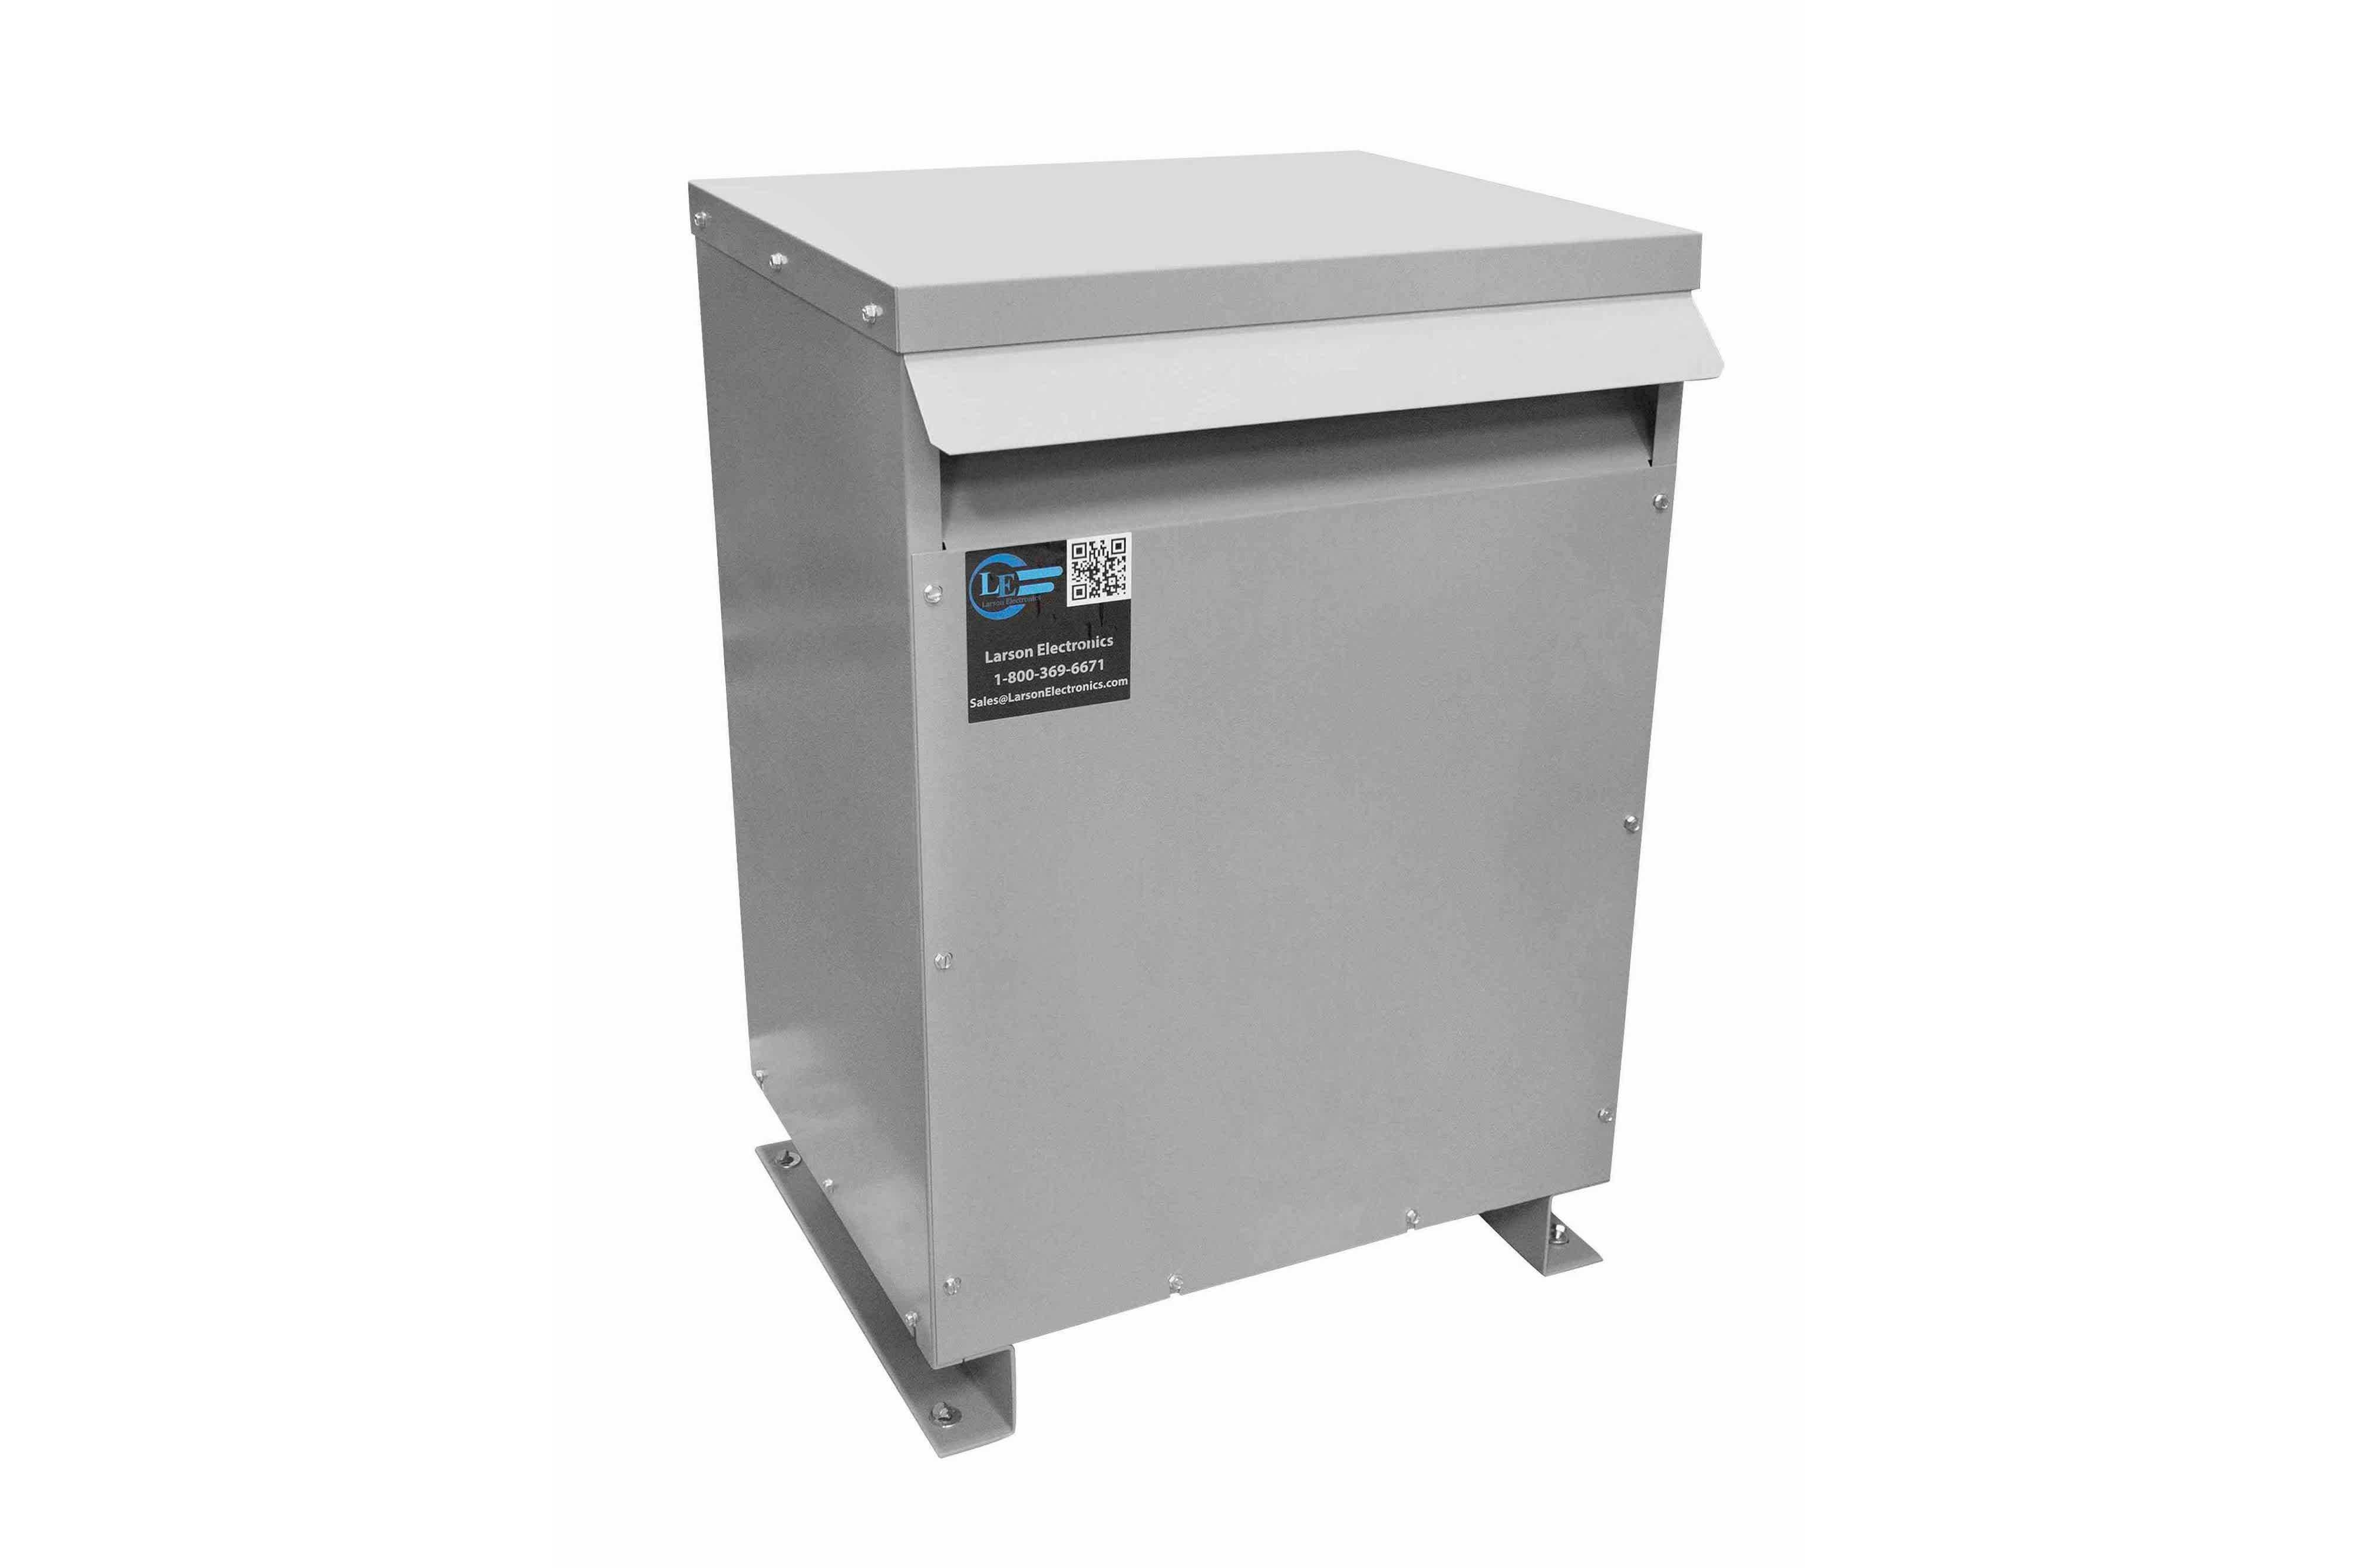 18 kVA 3PH Isolation Transformer, 400V Wye Primary, 208Y/120 Wye-N Secondary, N3R, Ventilated, 60 Hz